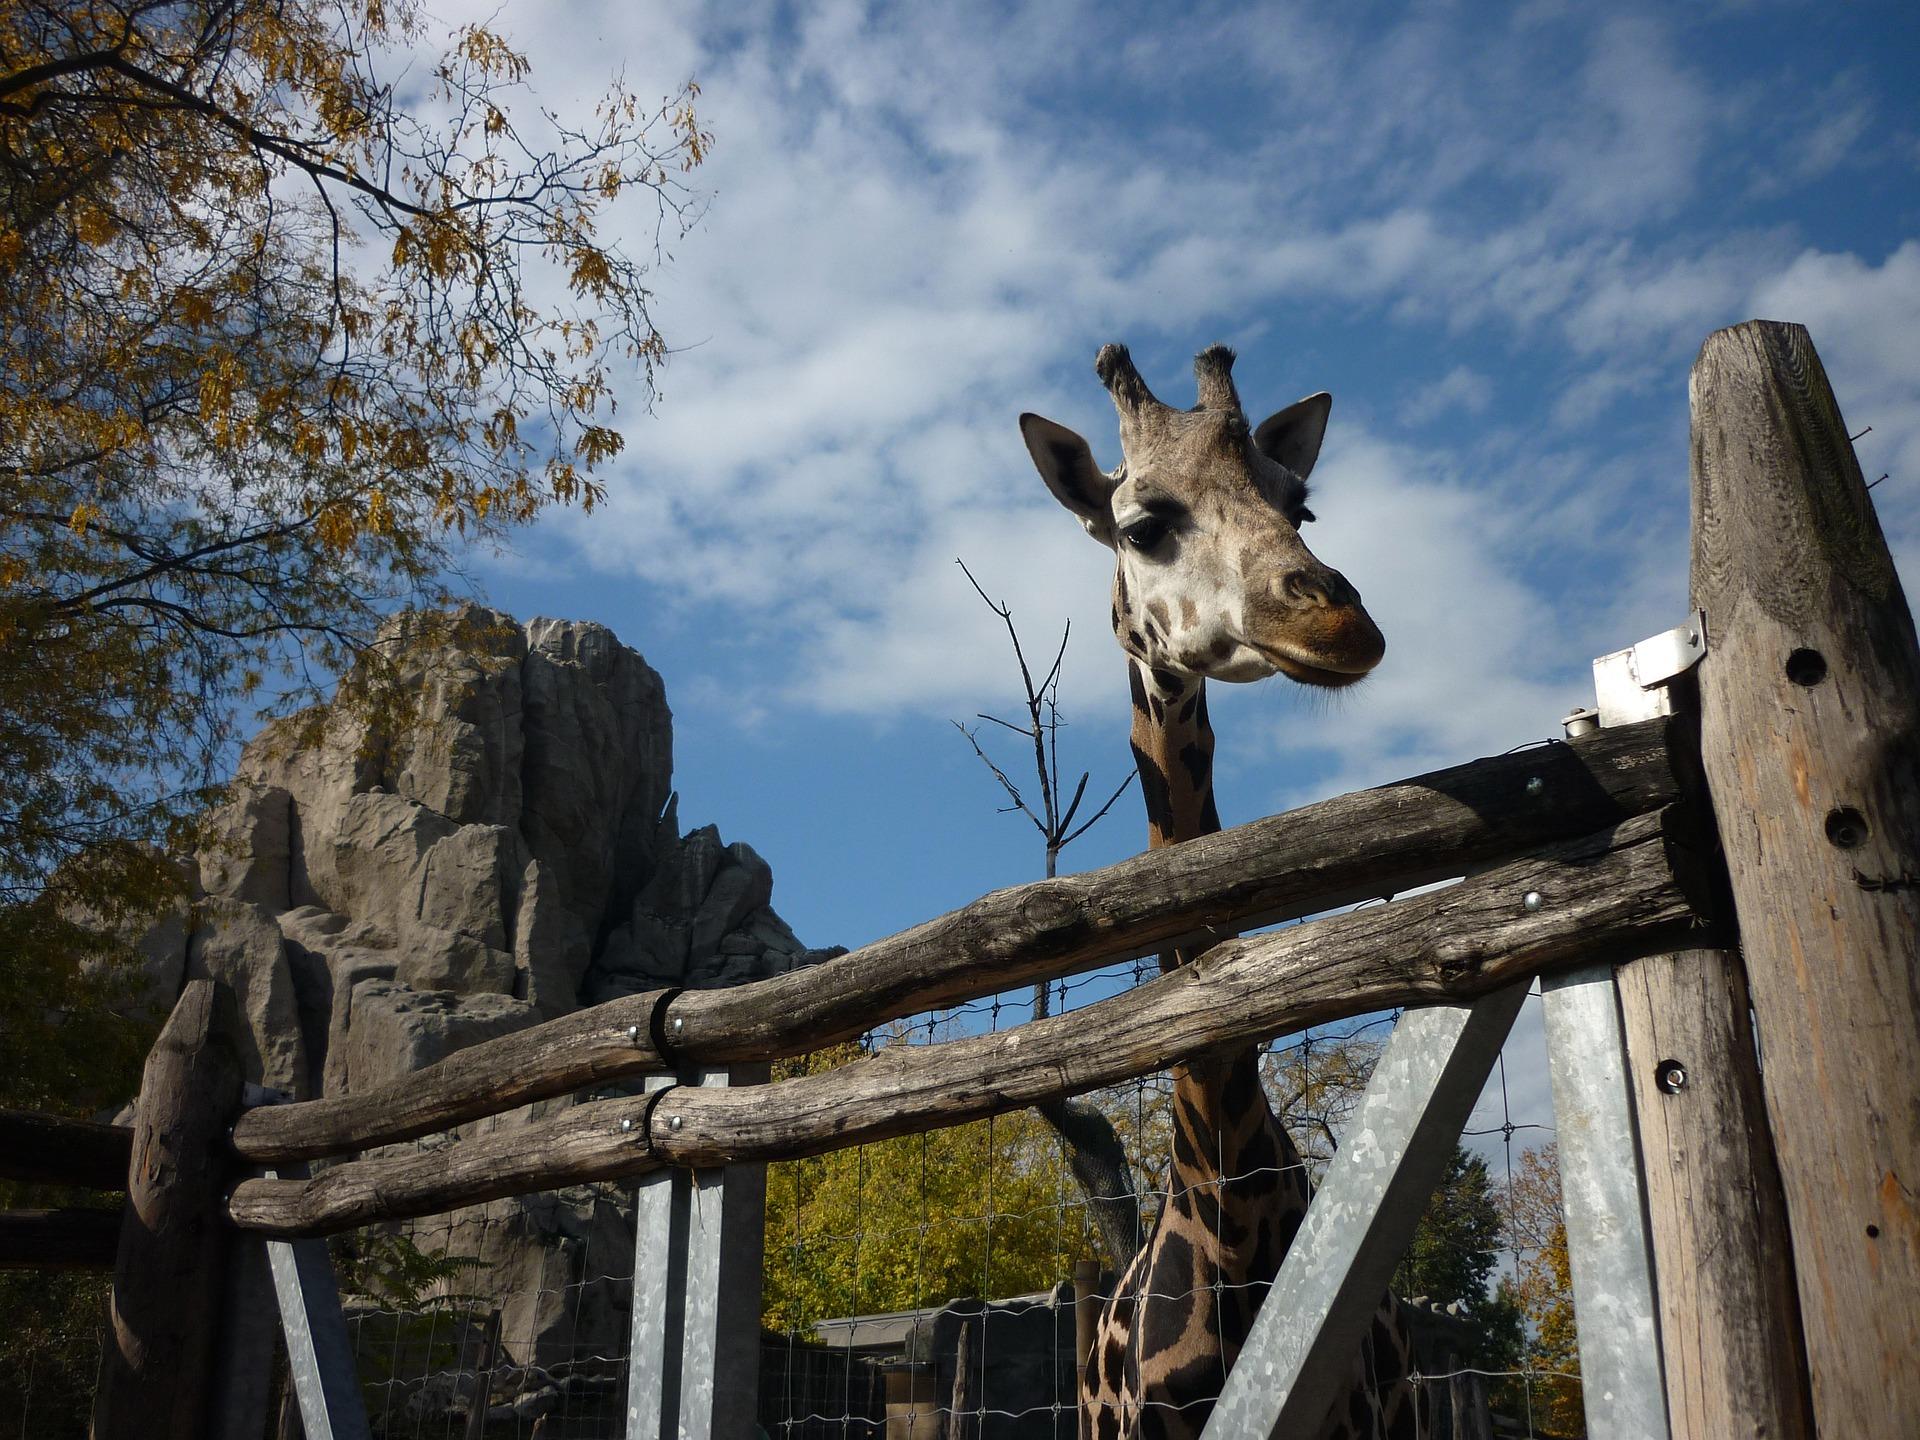 Giraffe at The Budapest Zoo, Budapest, Hungary